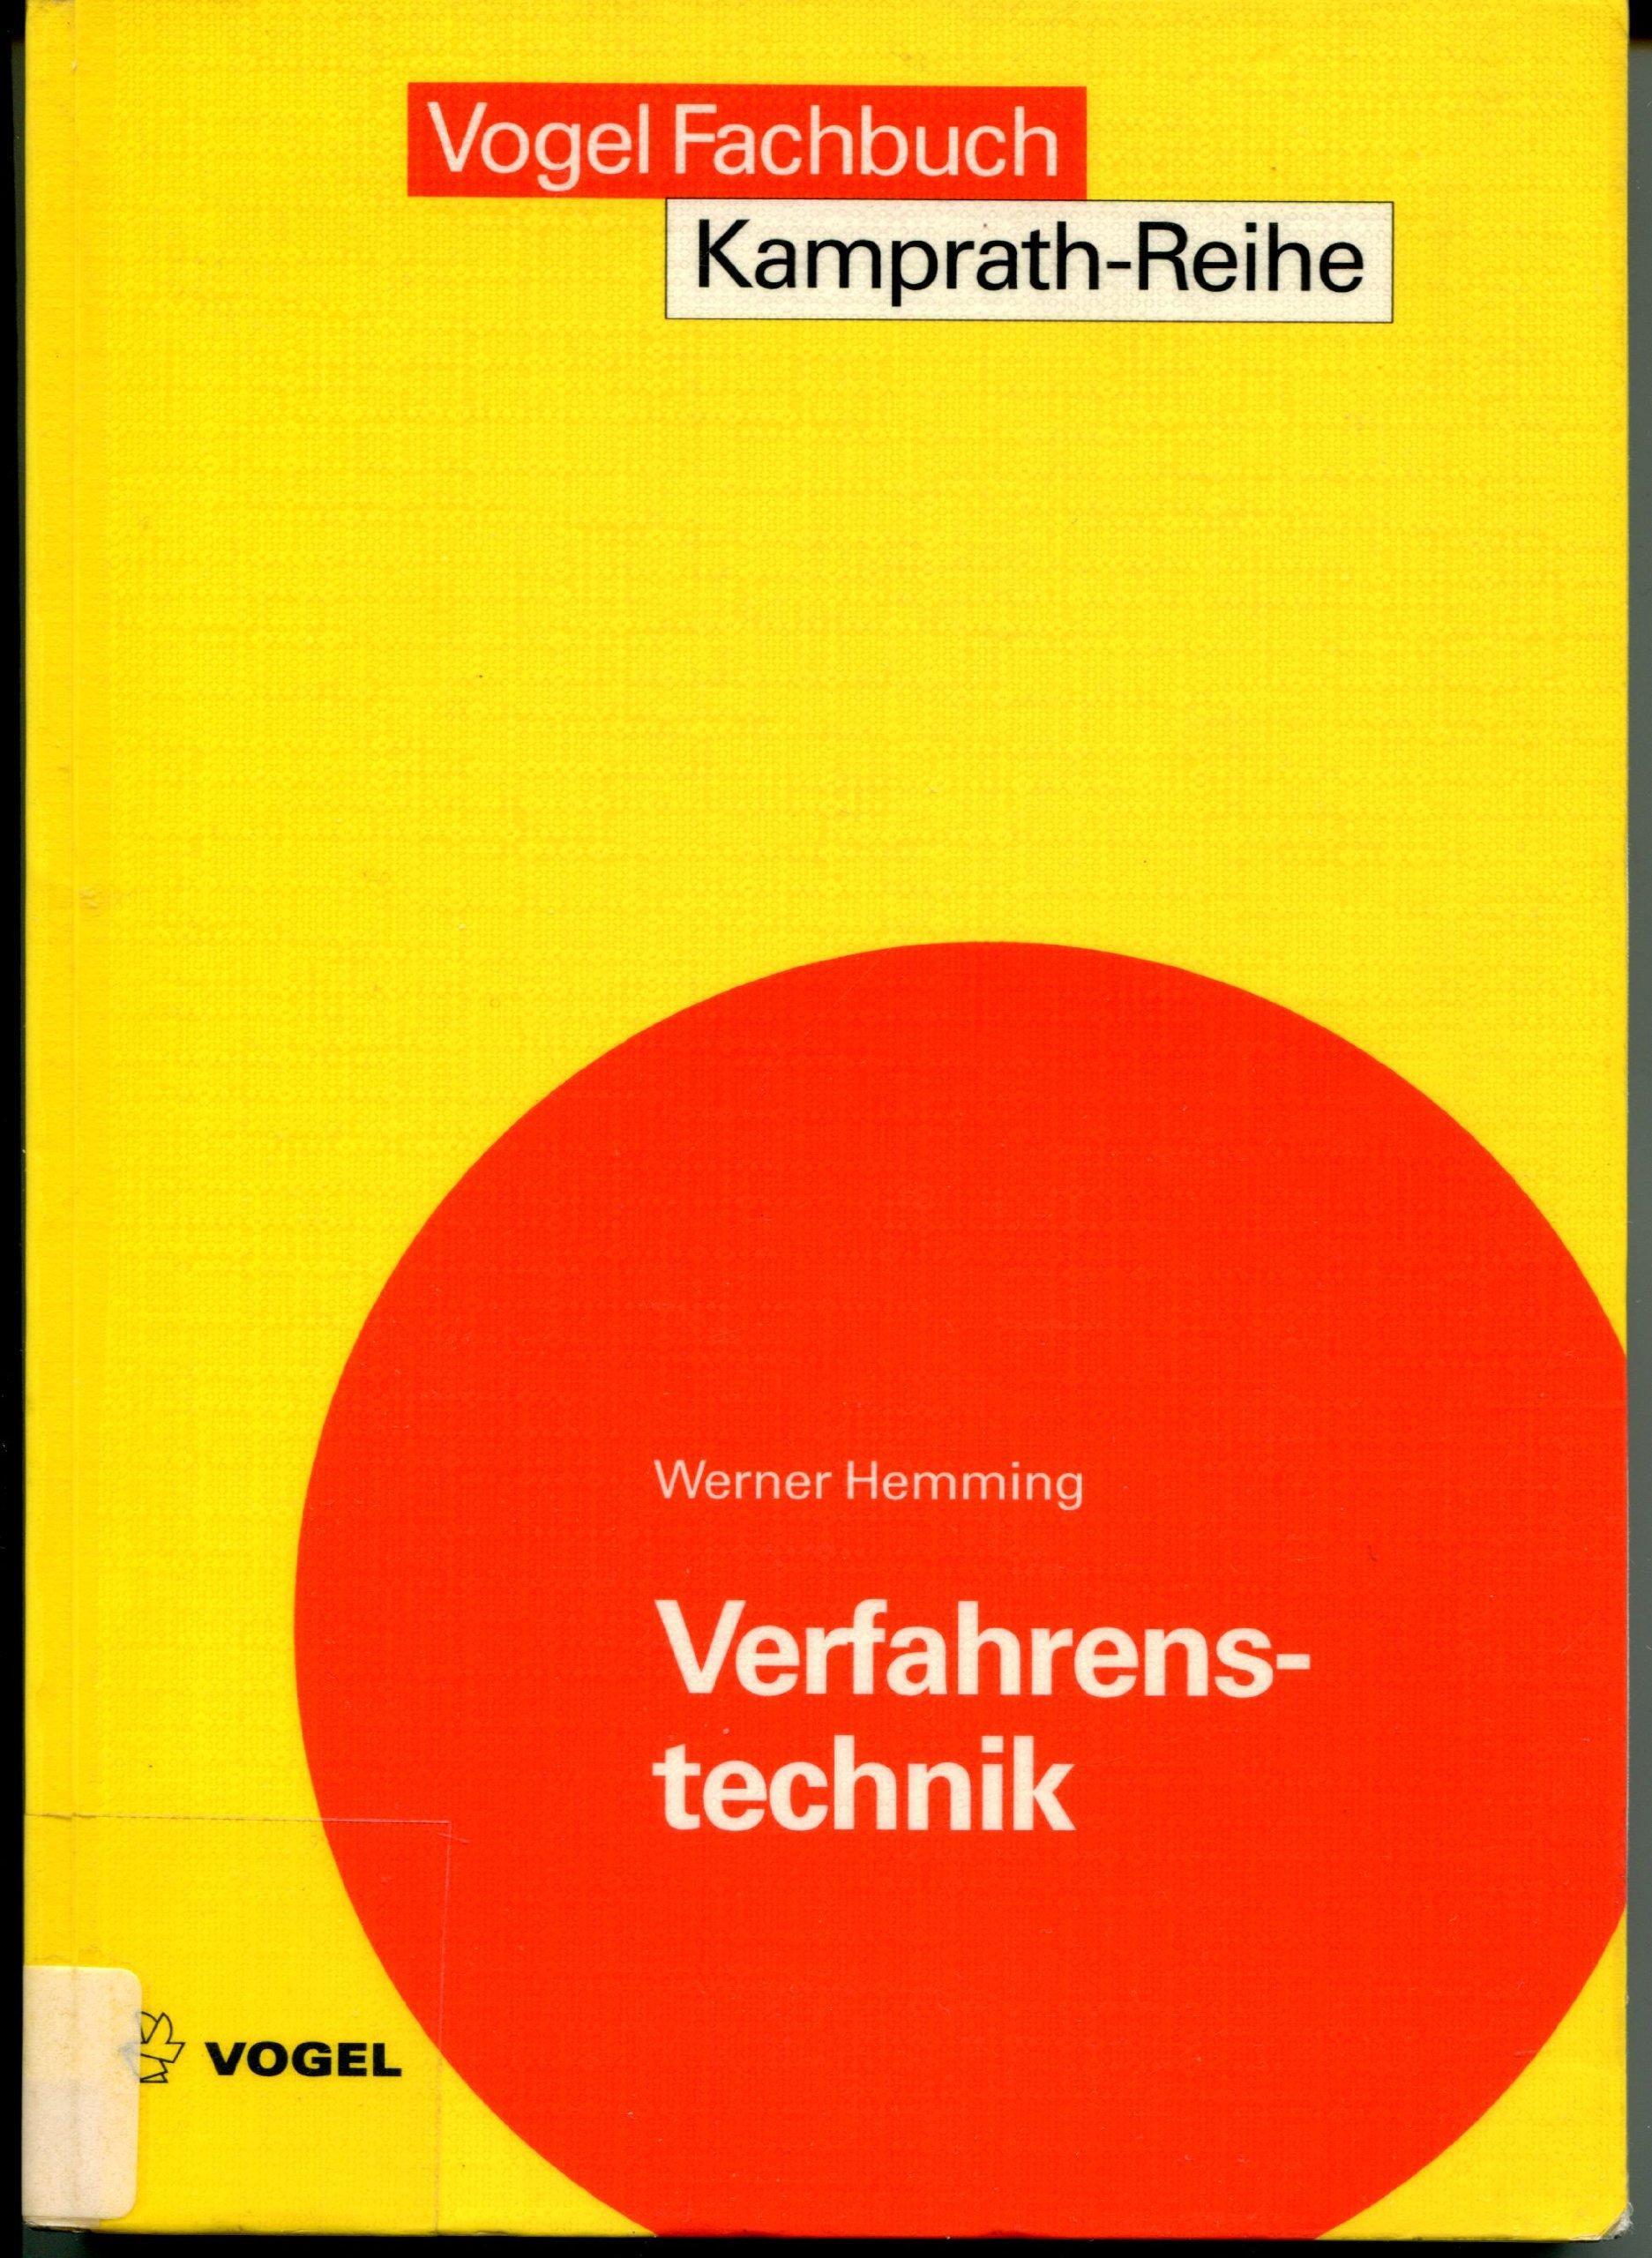 Verfahrenstechnik (Kamprath-Reihe)